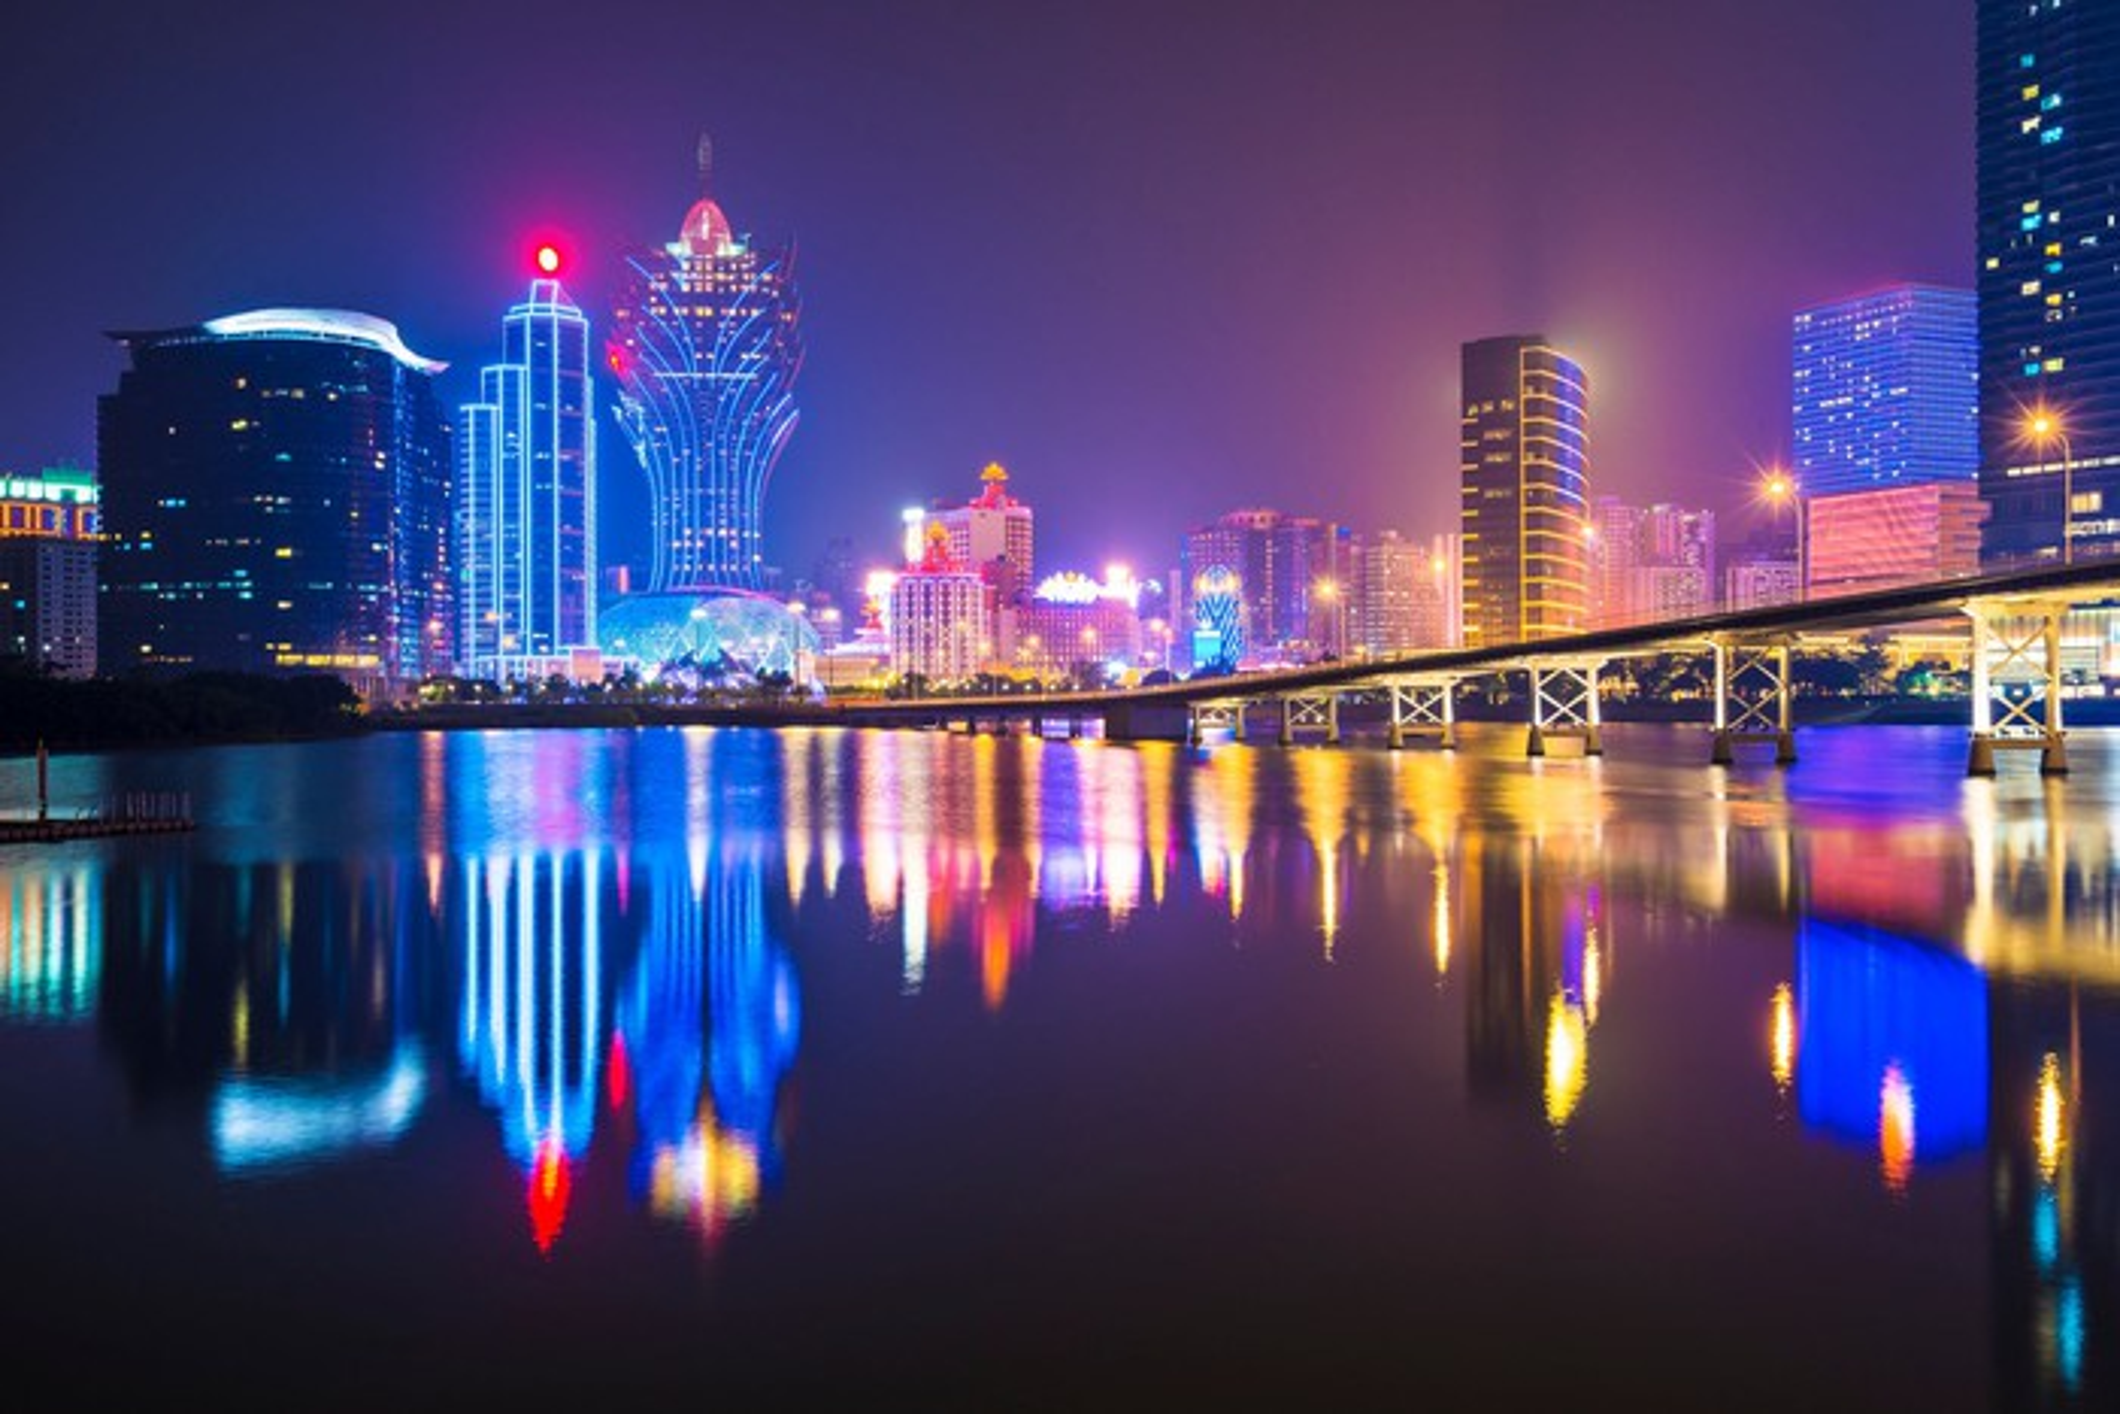 The Macau skyline.